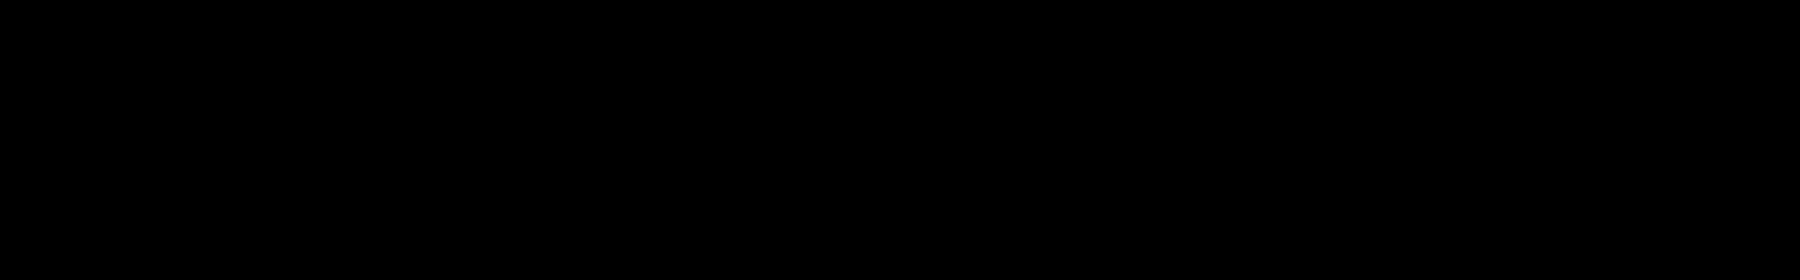 Cortex audio waveform